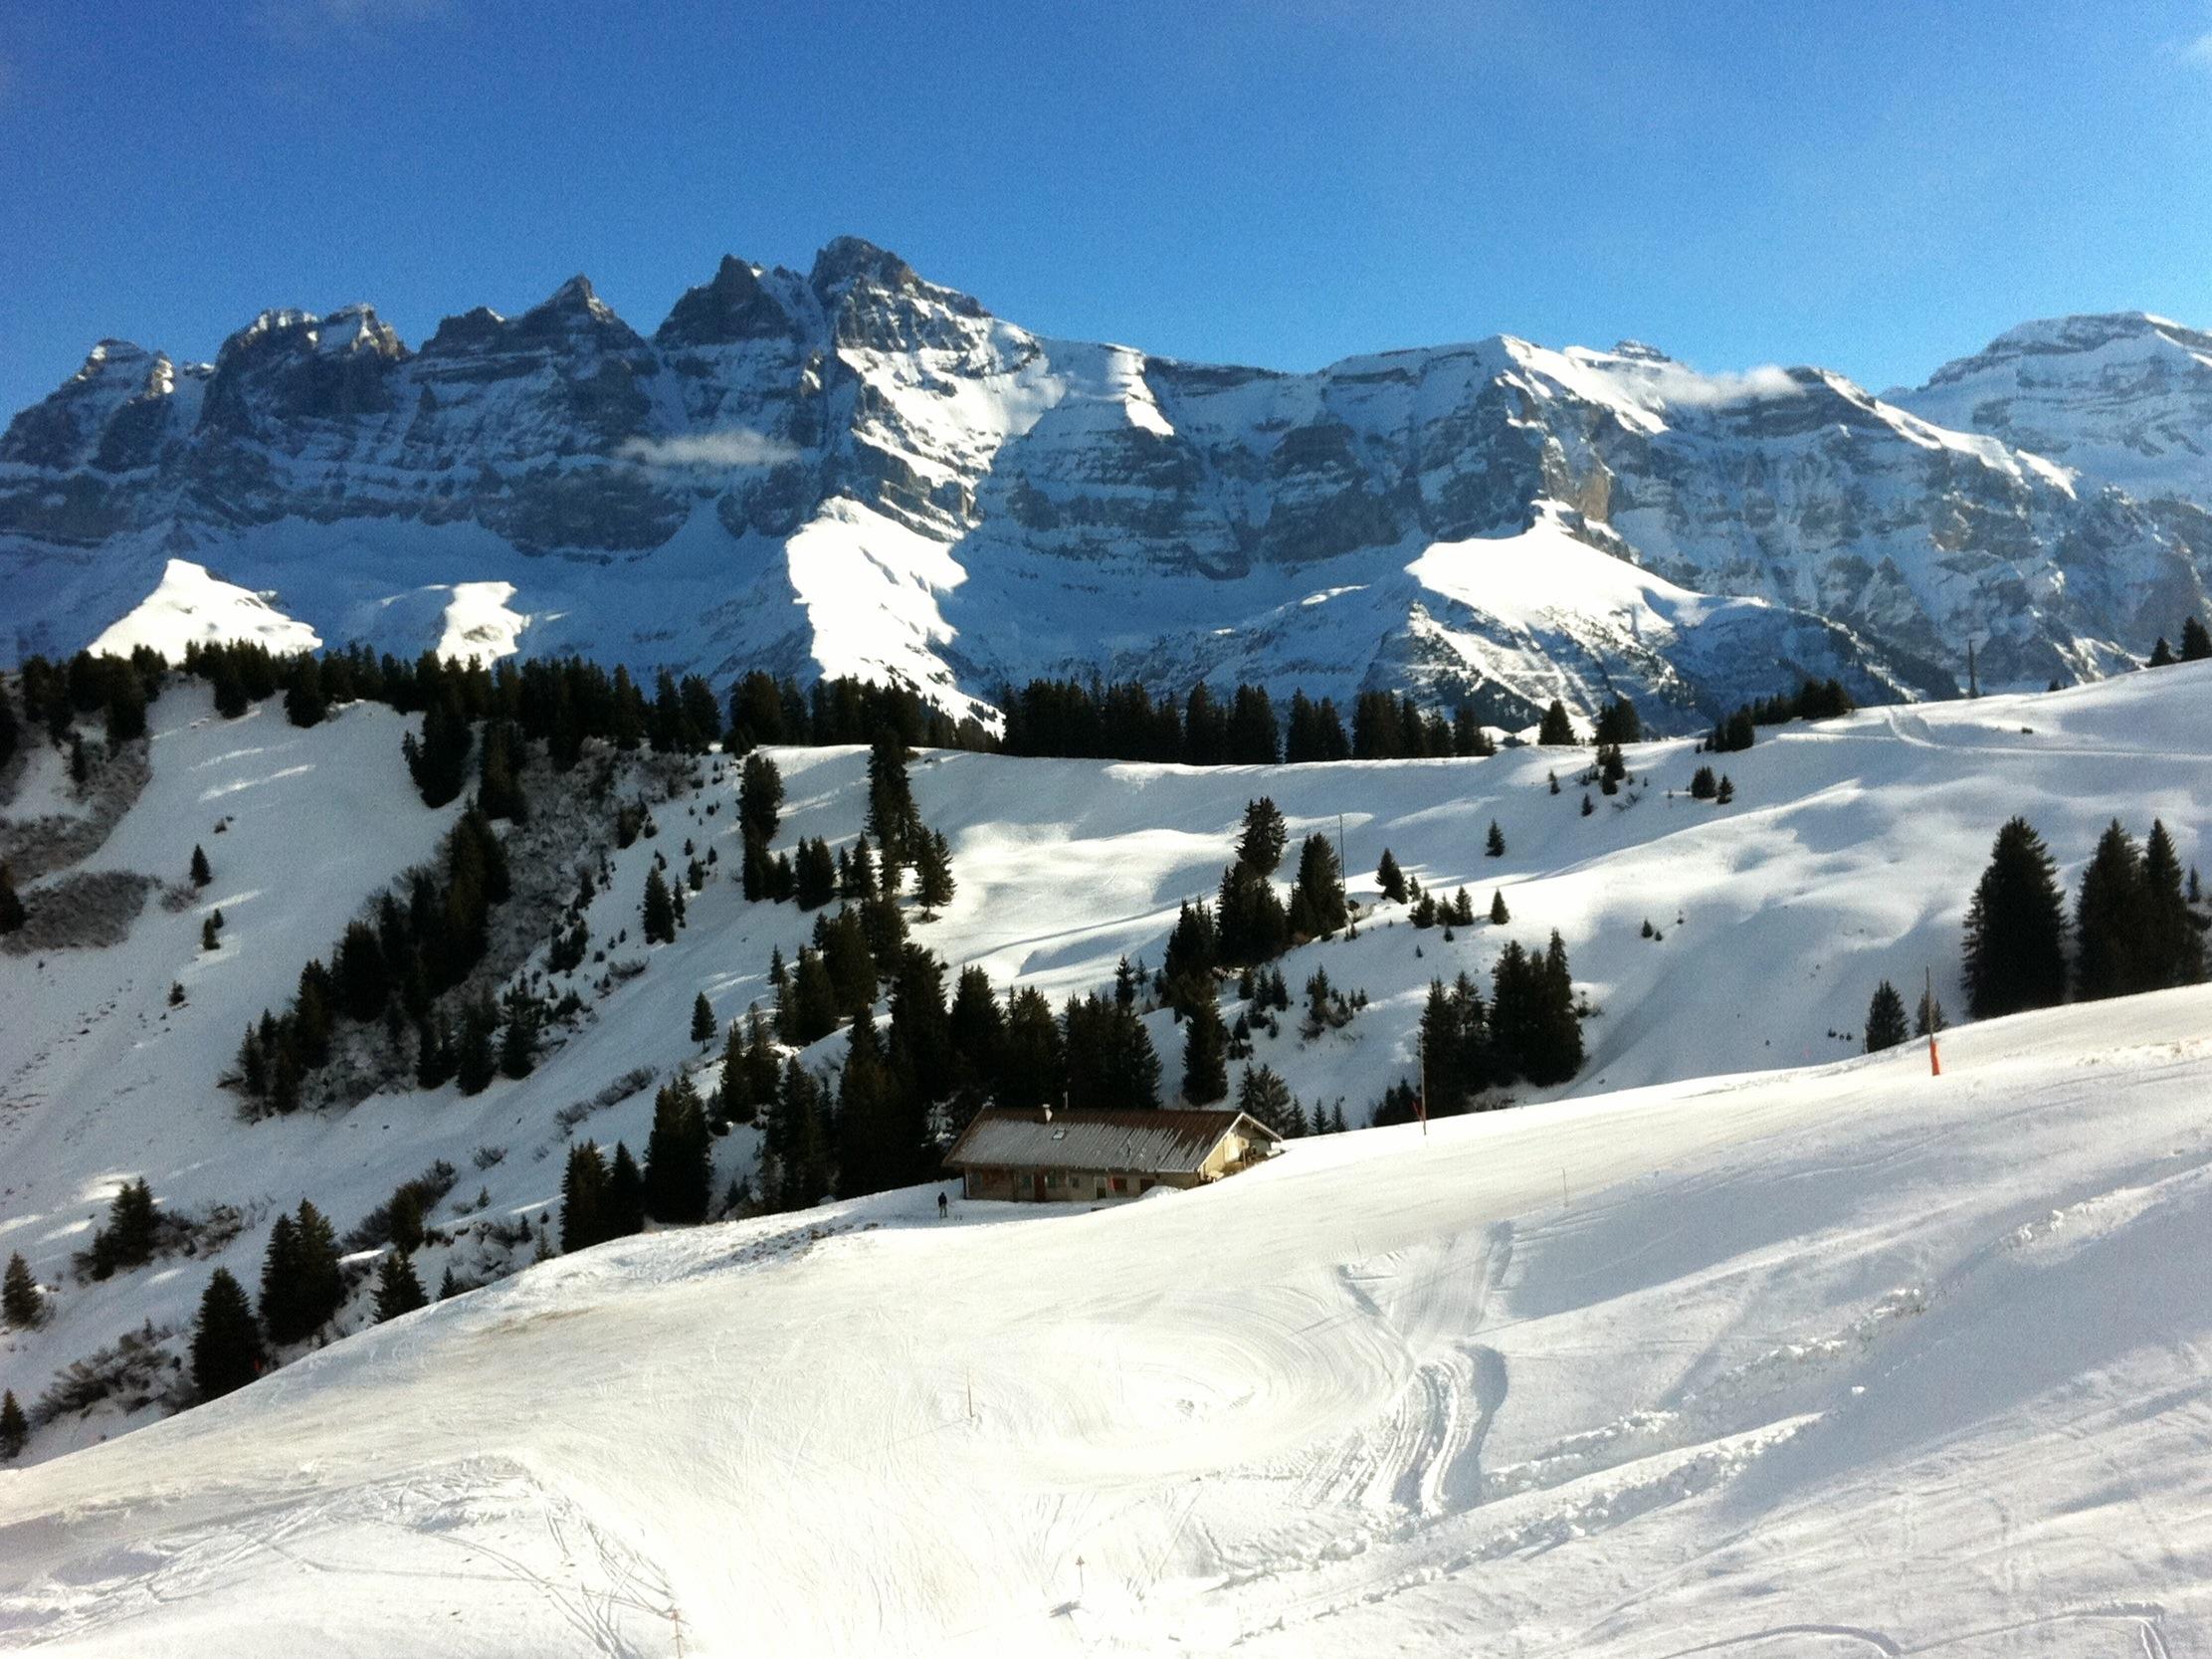 champery, switzerland - ski resort information, delas, guide review